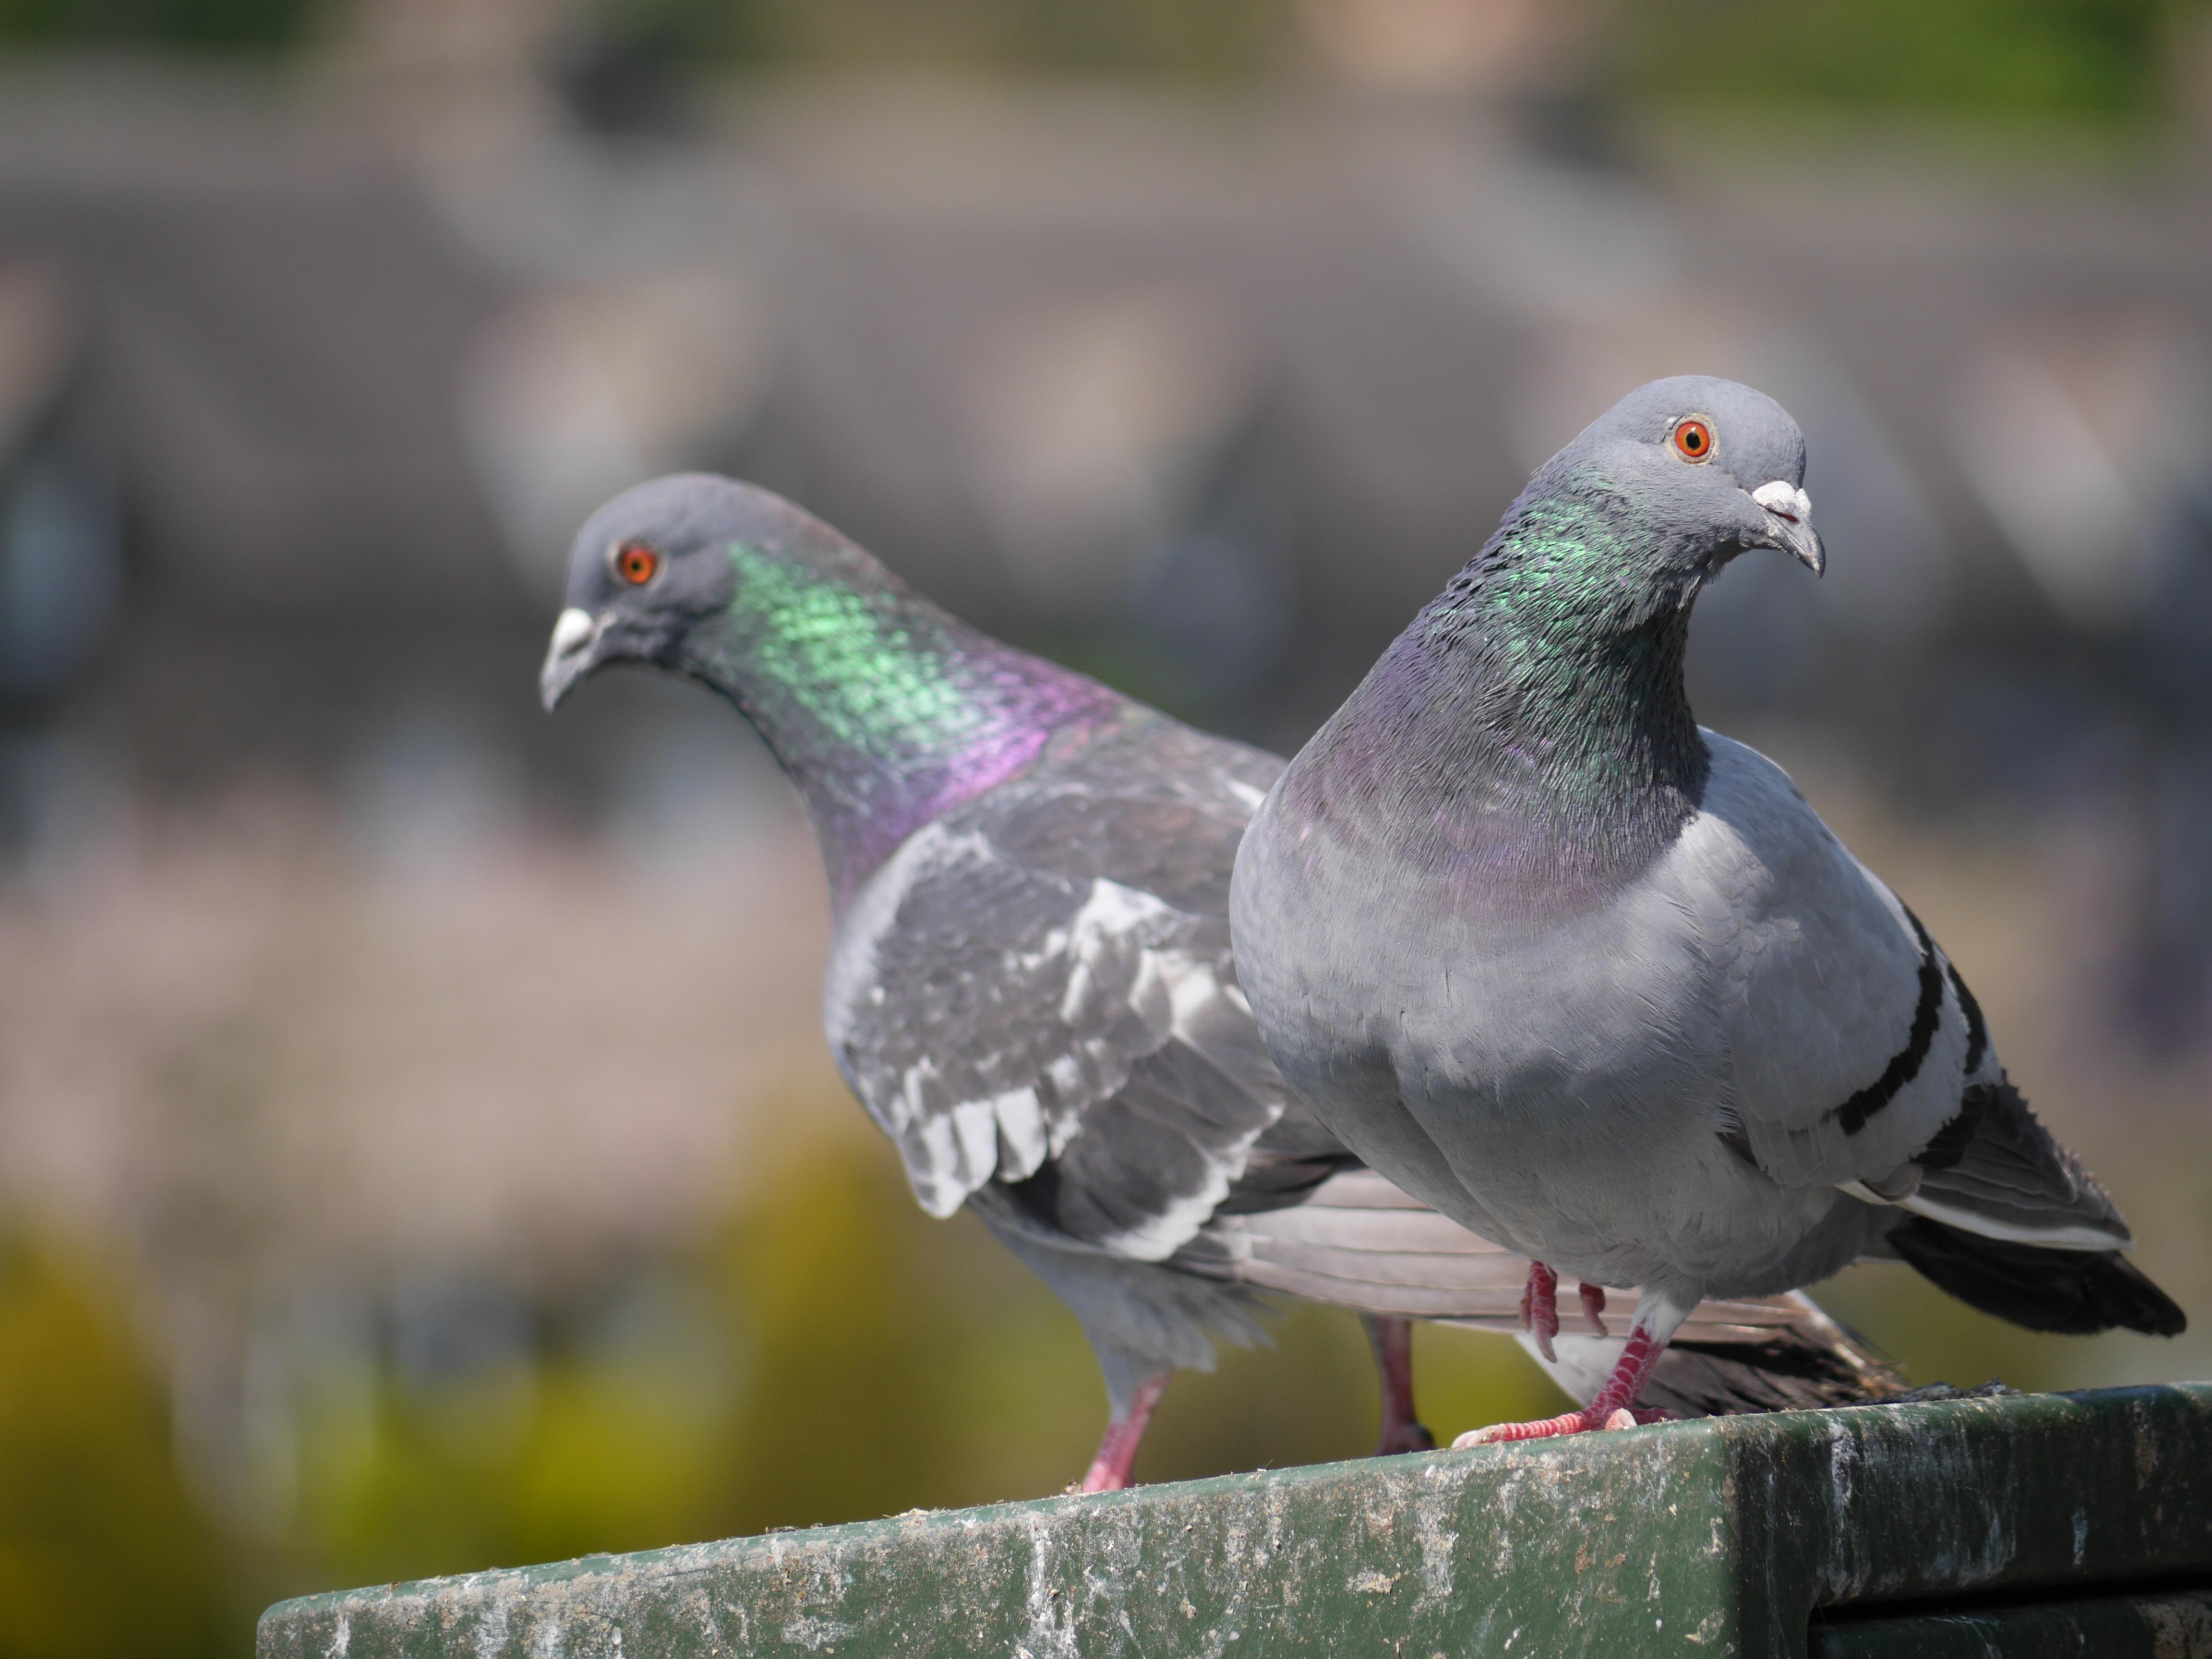 из-за голуби баян картинка депп